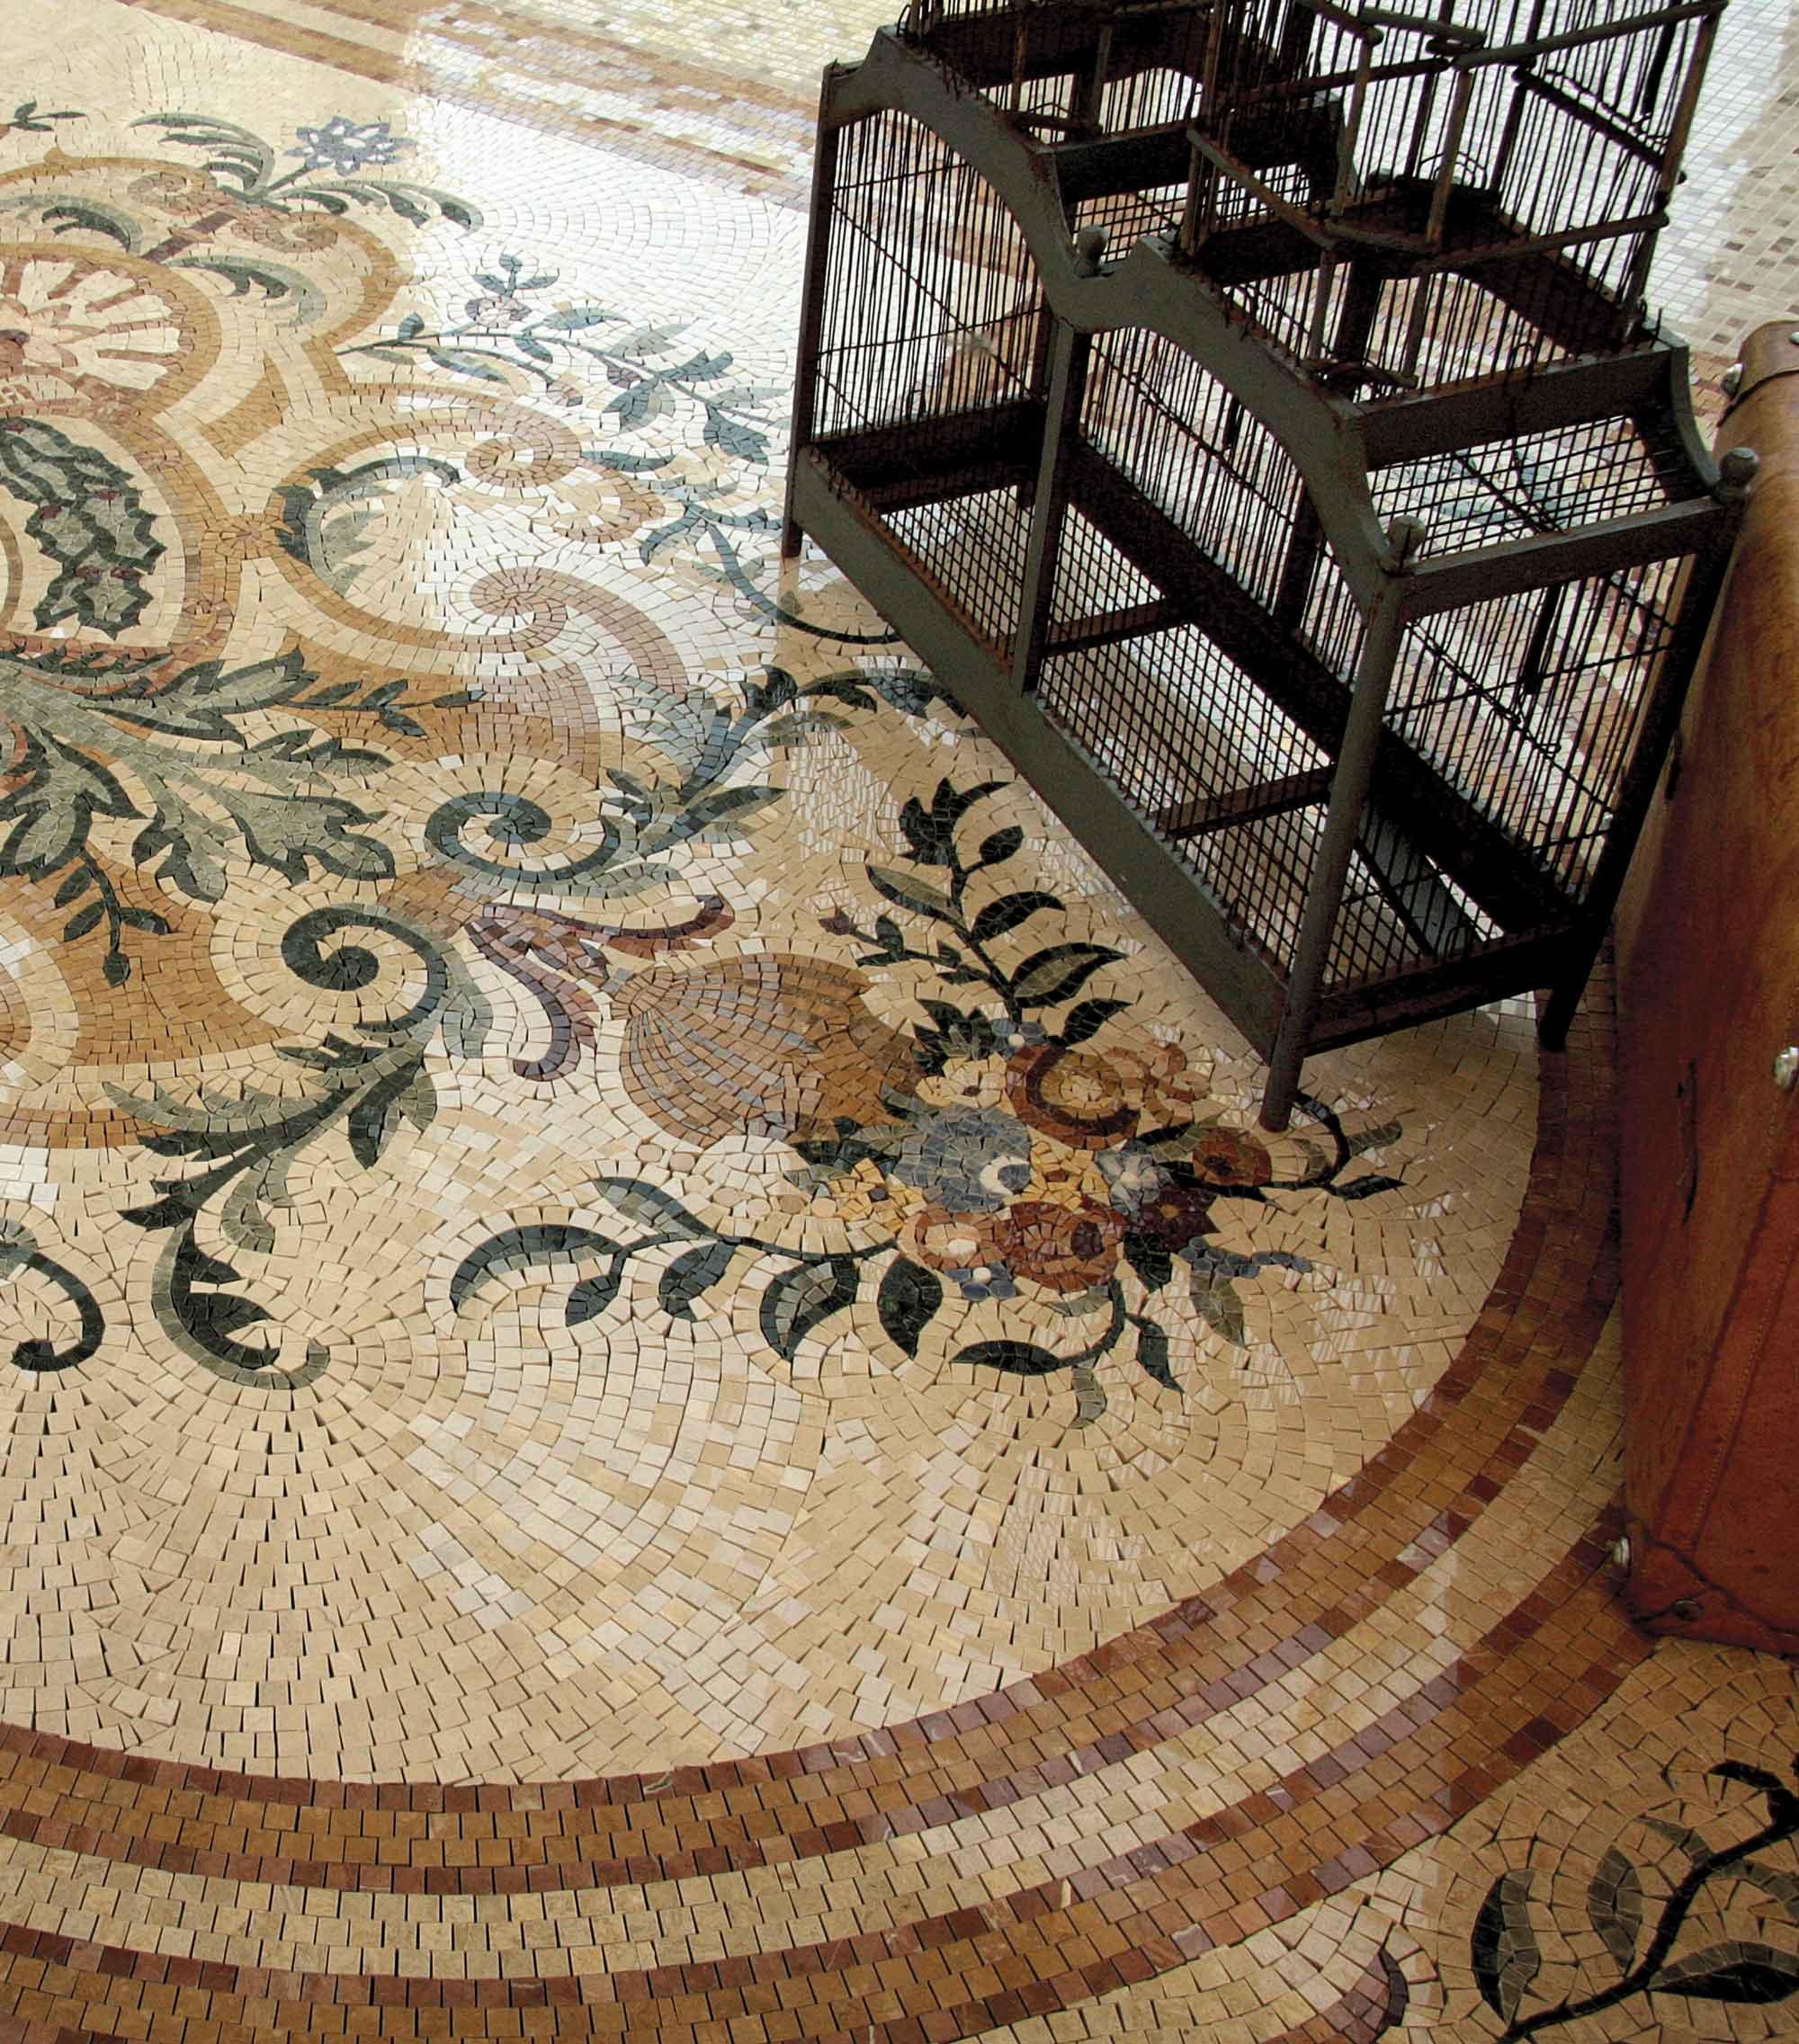 Le-havre Lithos mosaico italia